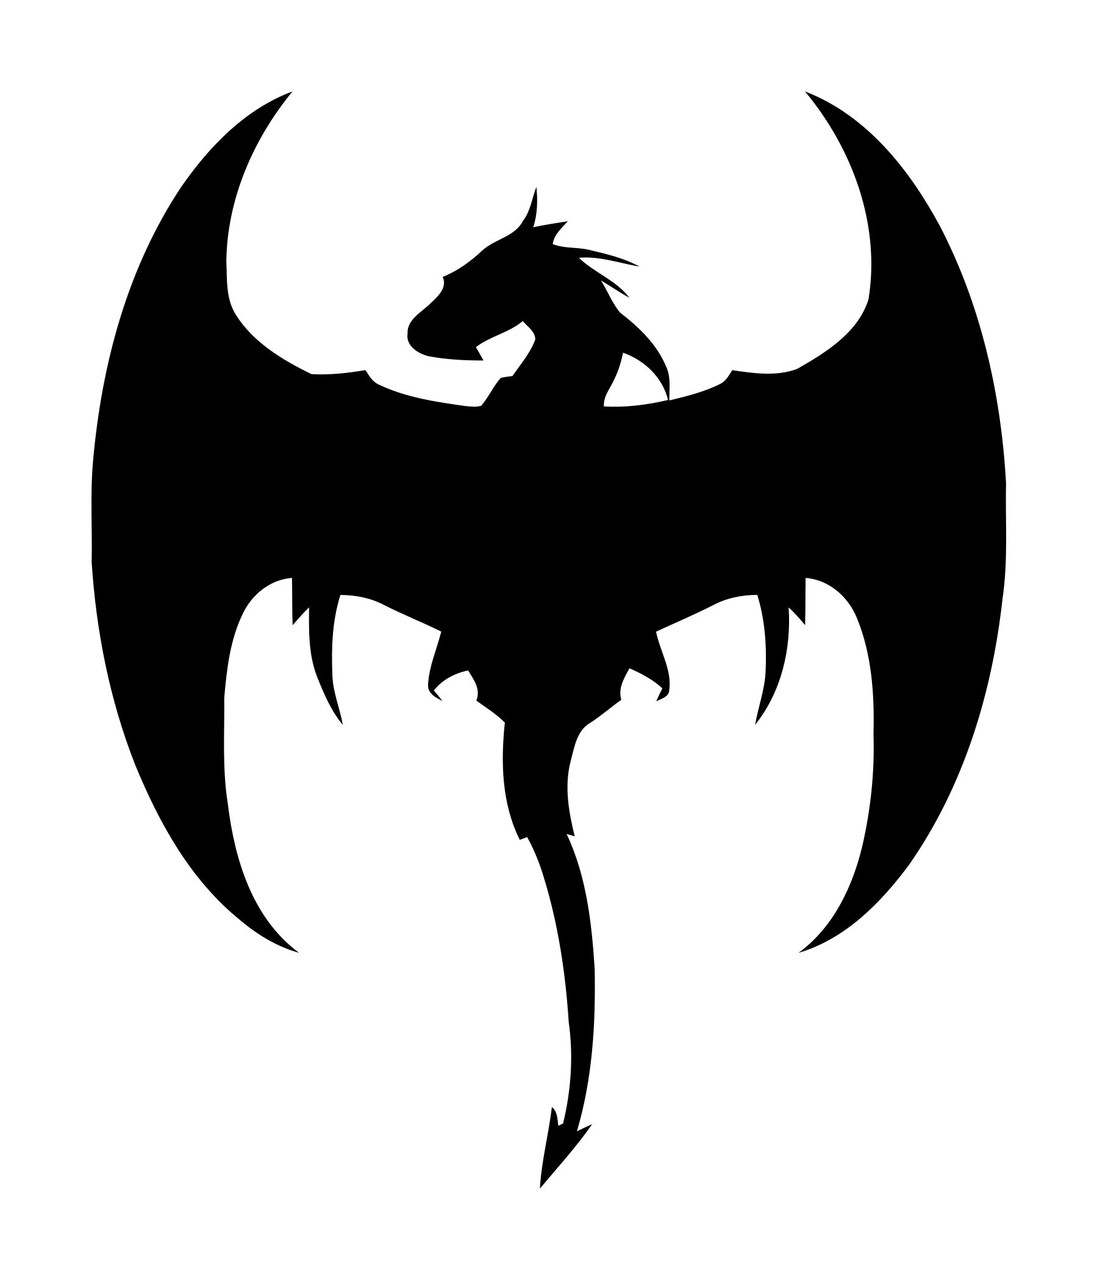 Flying Dragon Vinyl Decal Sticker -V4- Wyvern Fantasy Flying Serpent